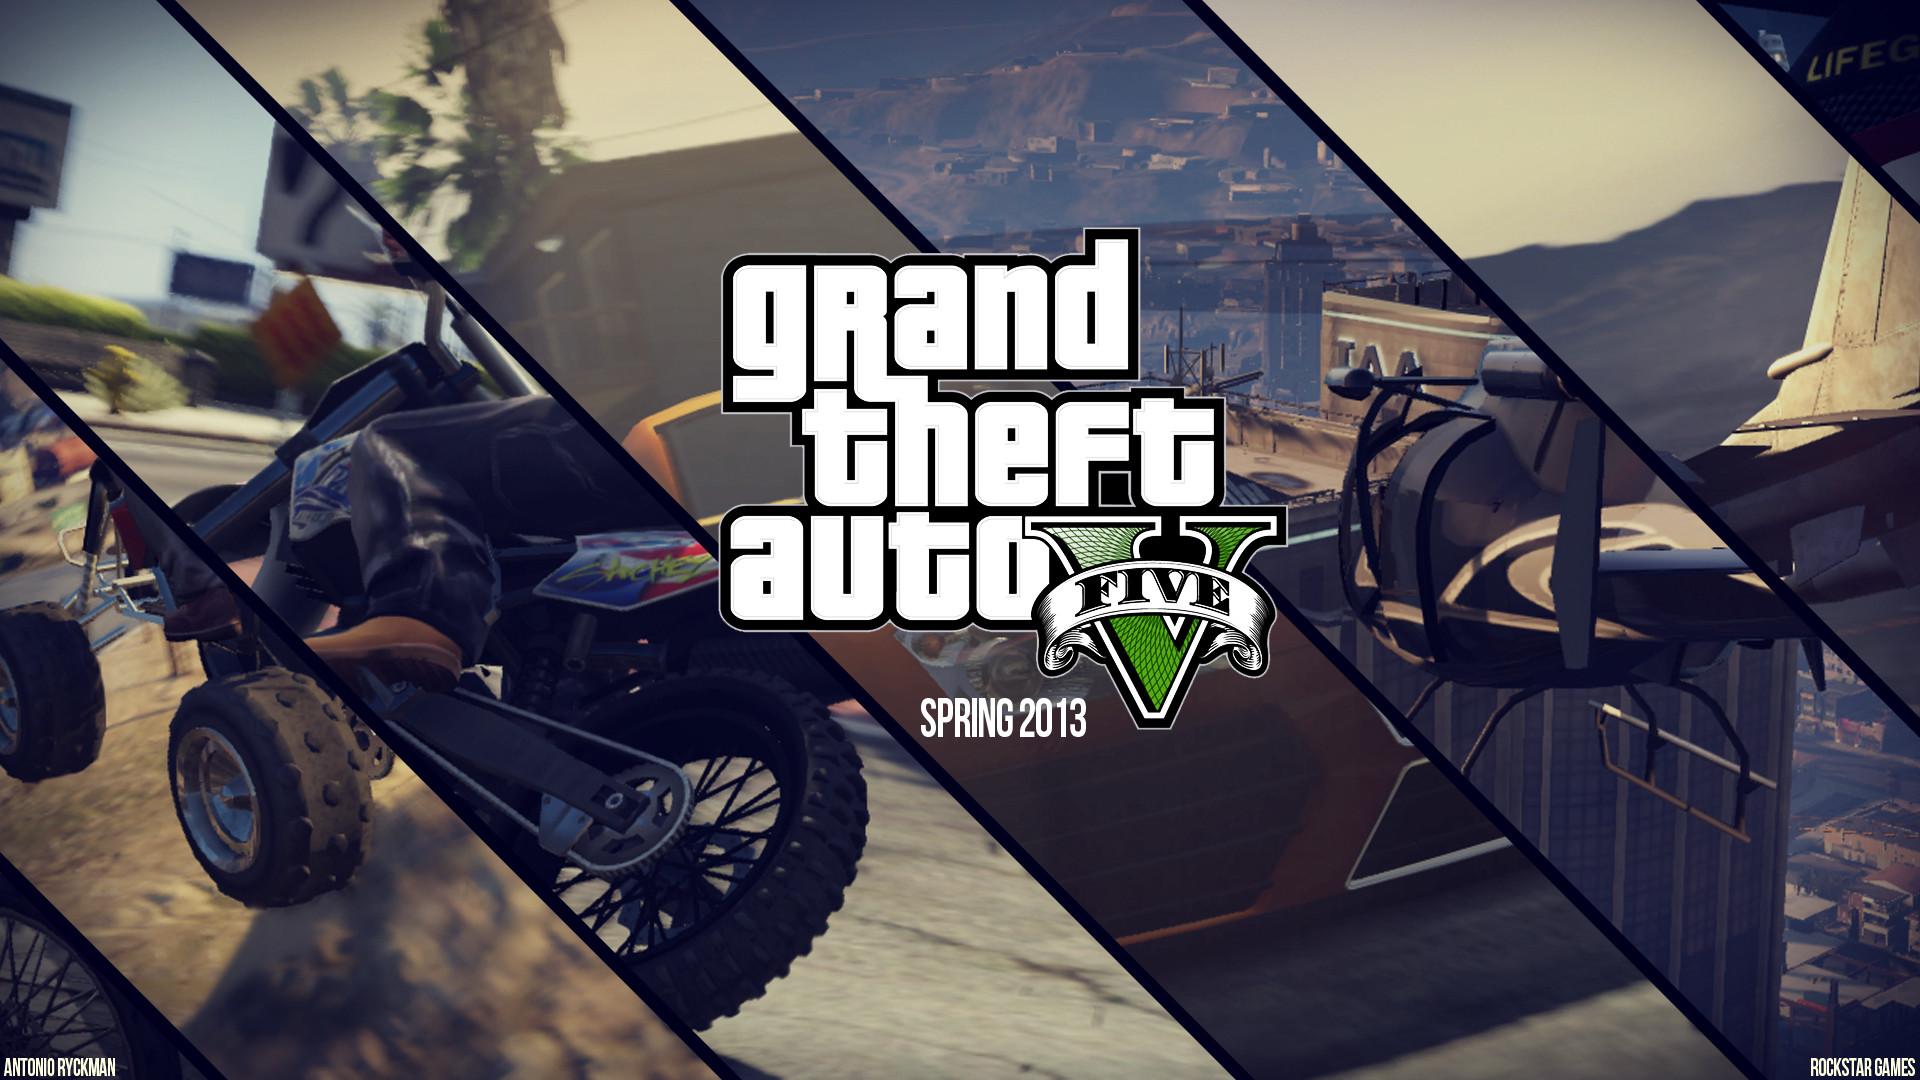 New Grand Theft Auto 5 Gta V Wallpapers 6 – https://tophdwallpaper.